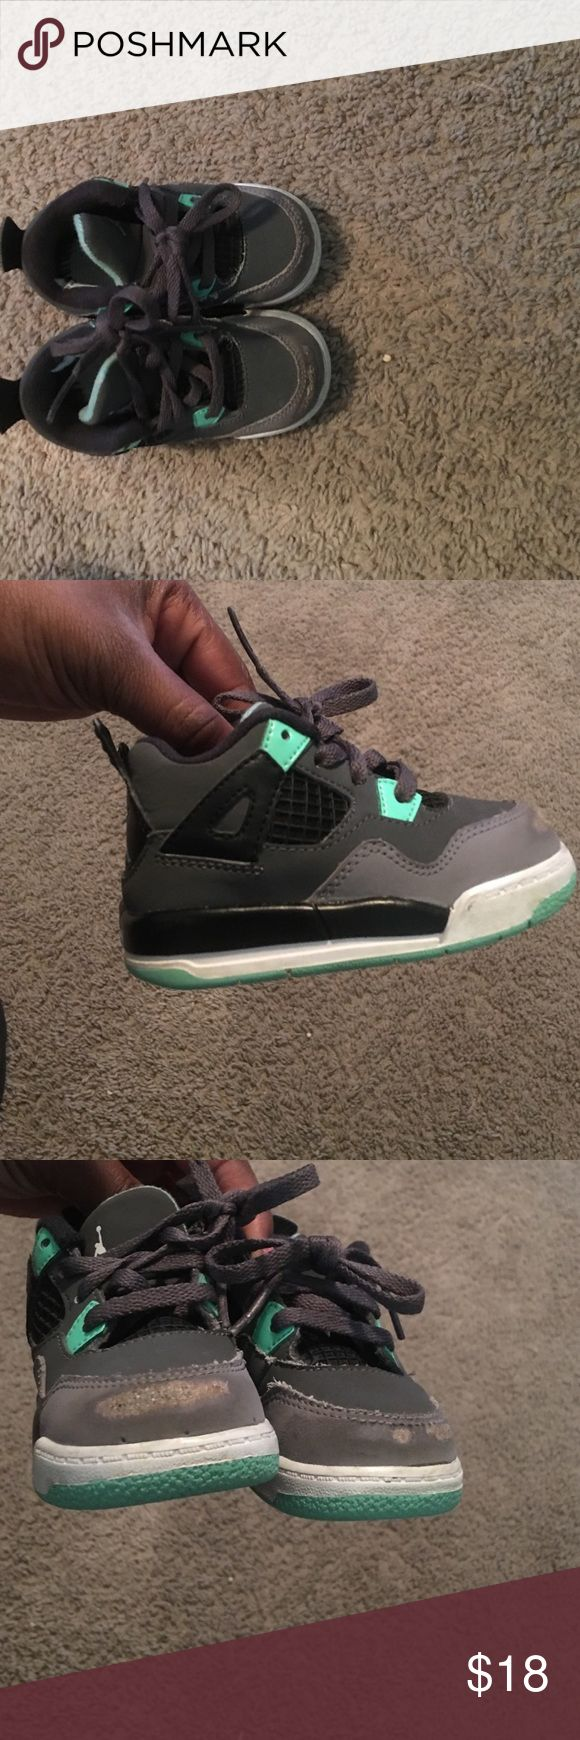 Retro Jordan 4's in good condition Retro Jordan 4's in good condition. No insoles and the toes have some scuffs as shown in picture! Jordan Shoes Baby & Walker